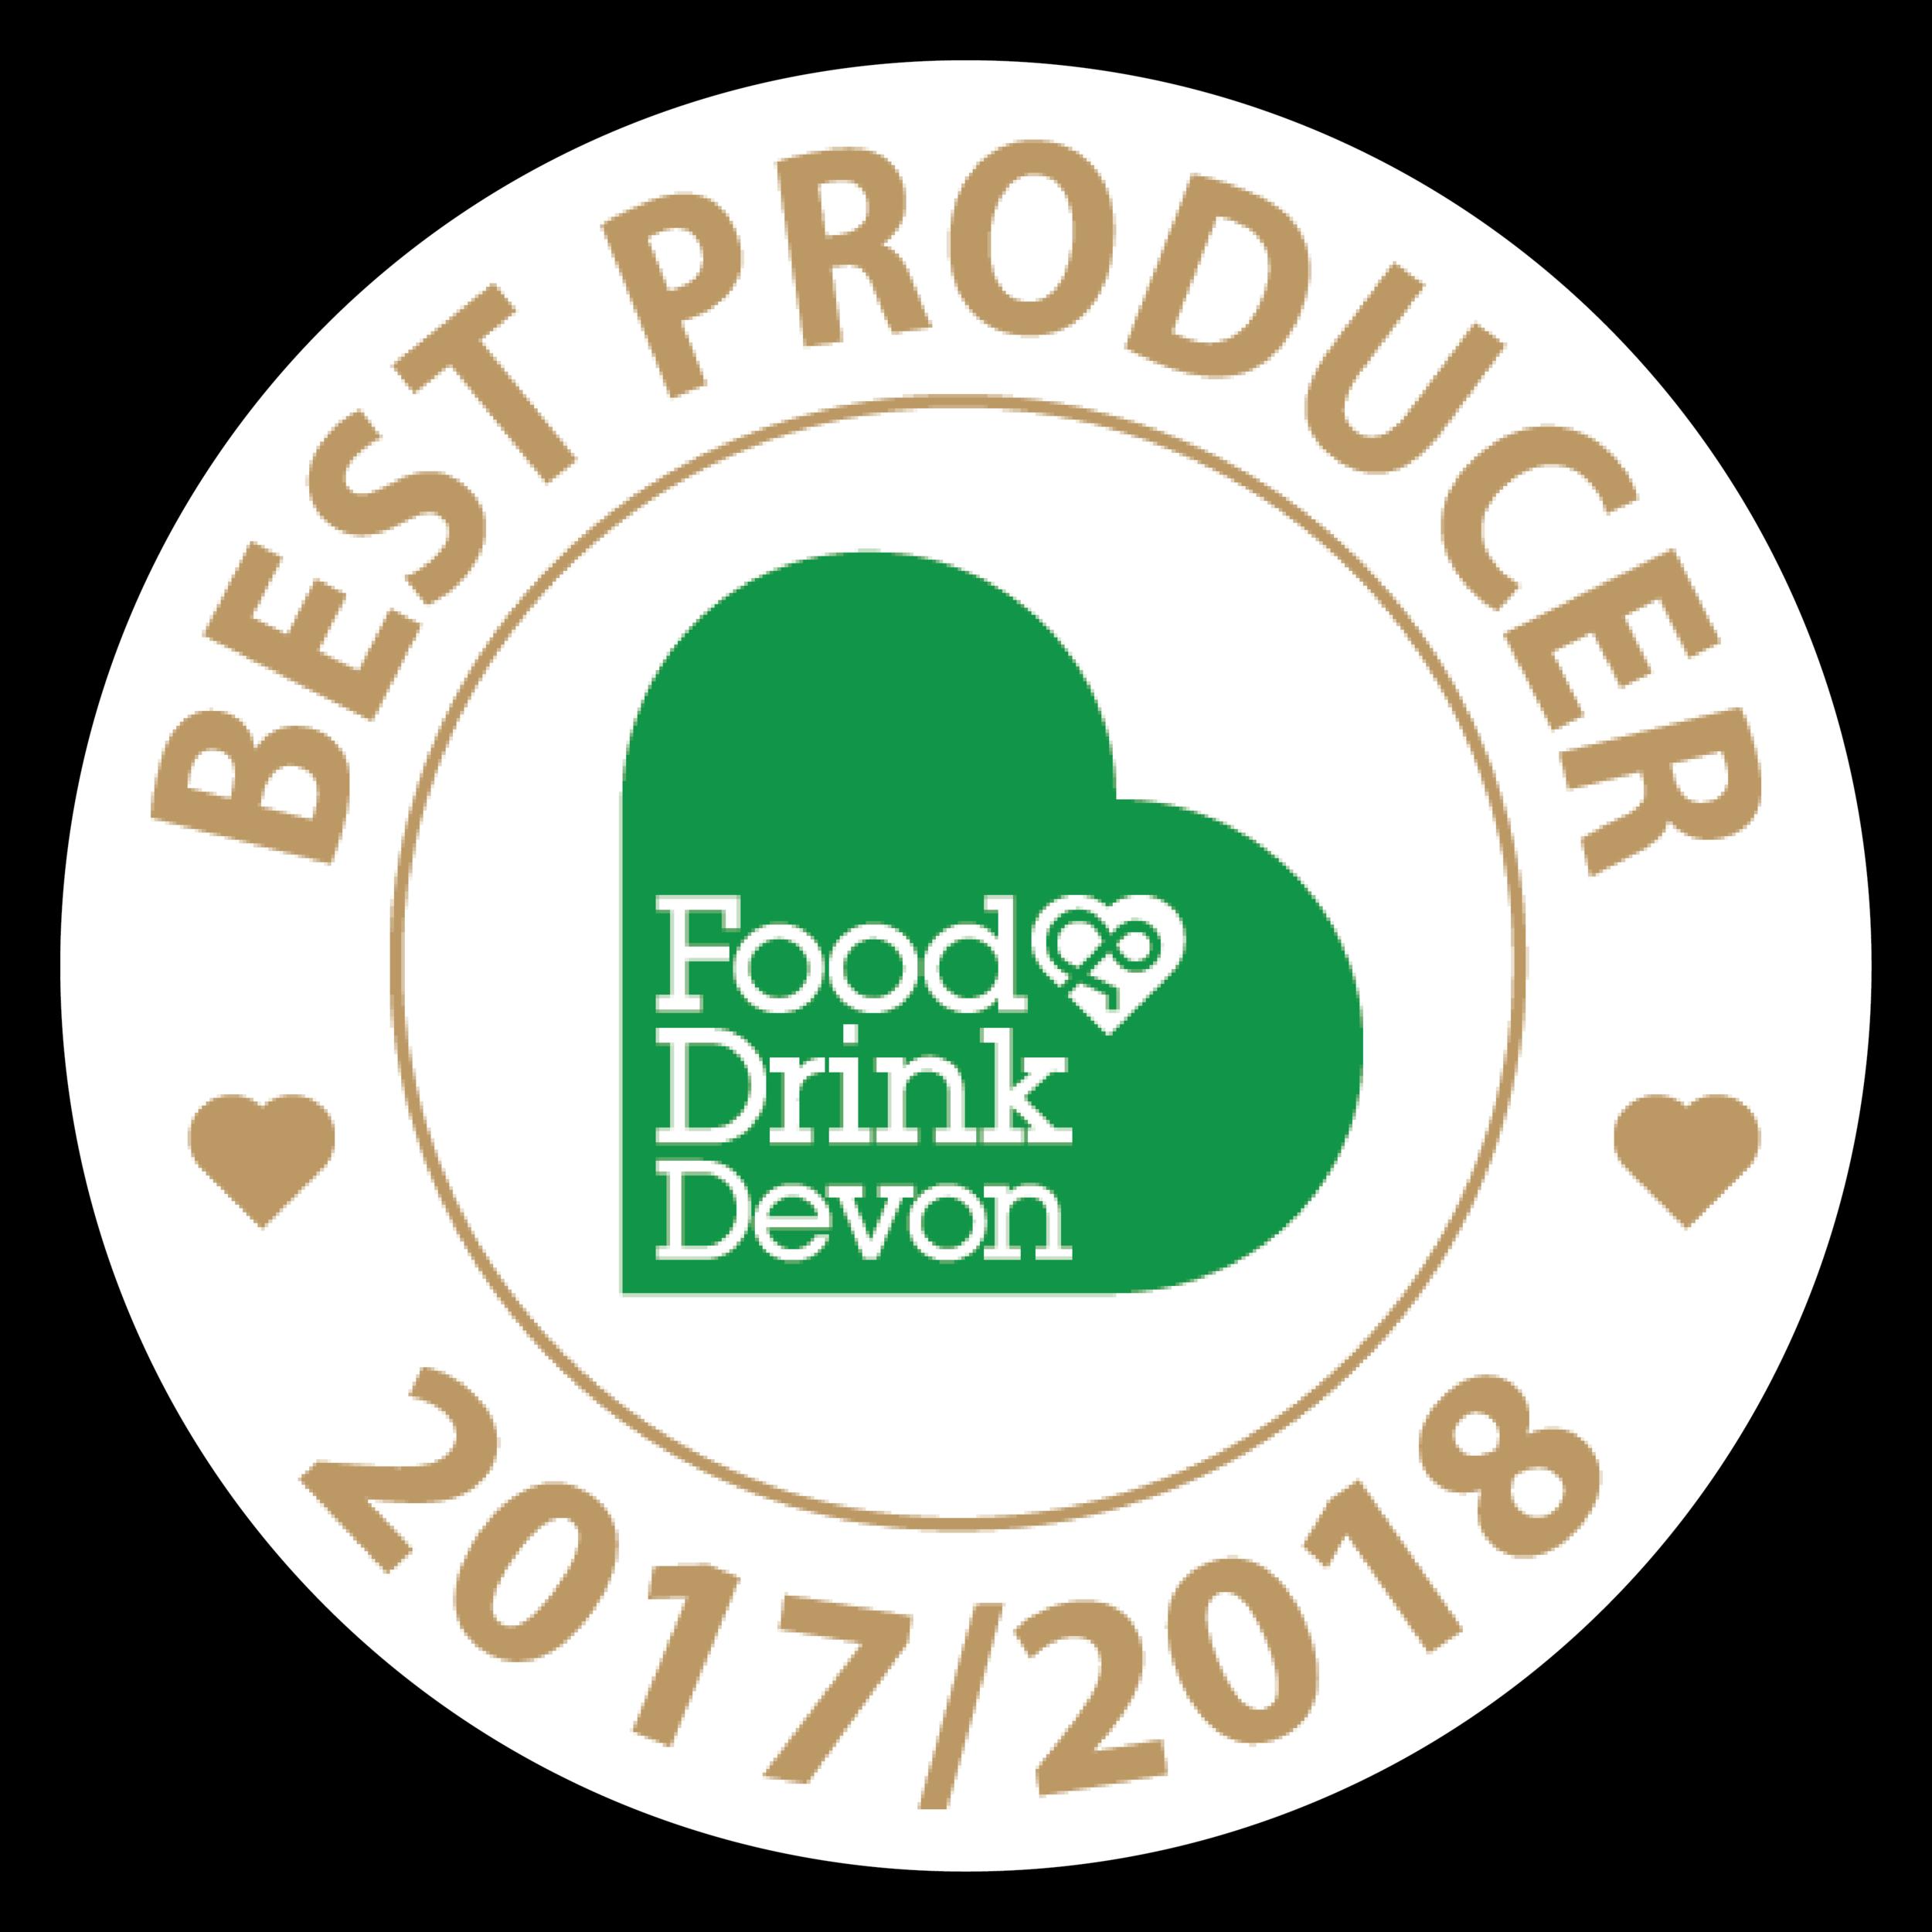 Food & Drink Devon Best Producer 2017/2018